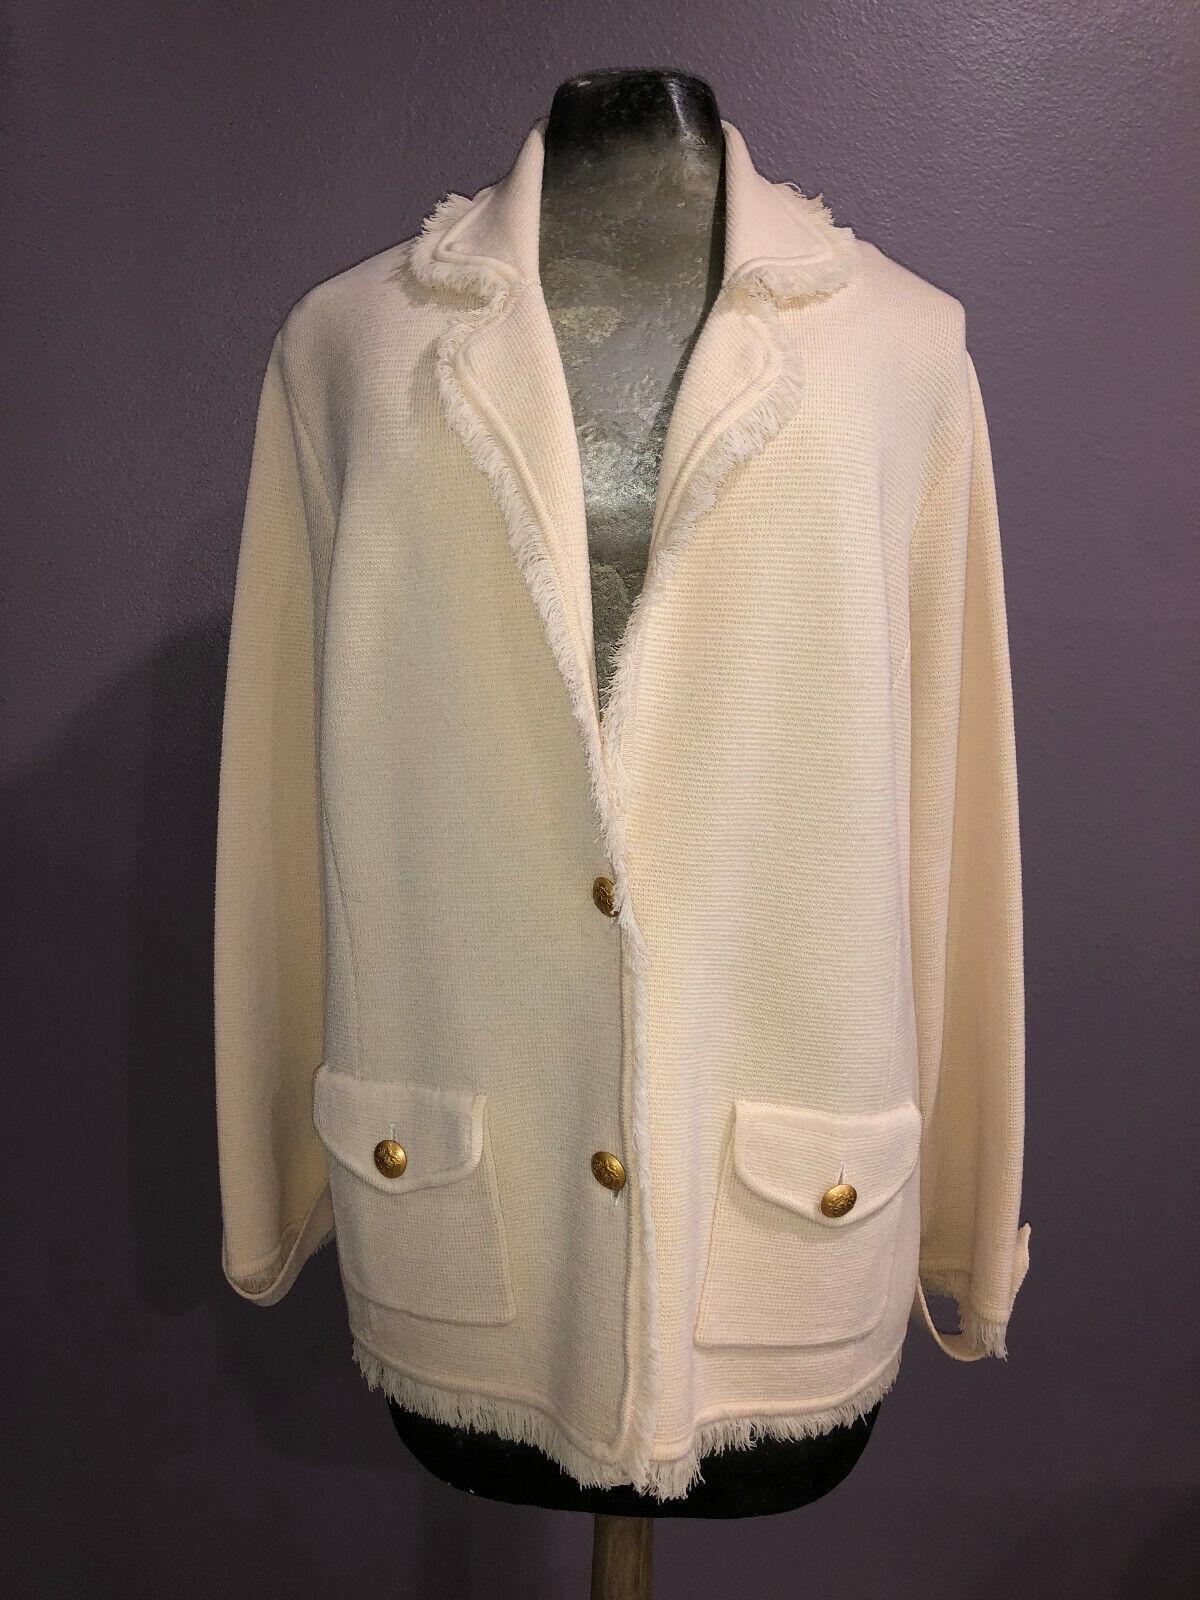 Bloomingdales 100% Wool Knit Cardigan Jacket Sz 2X